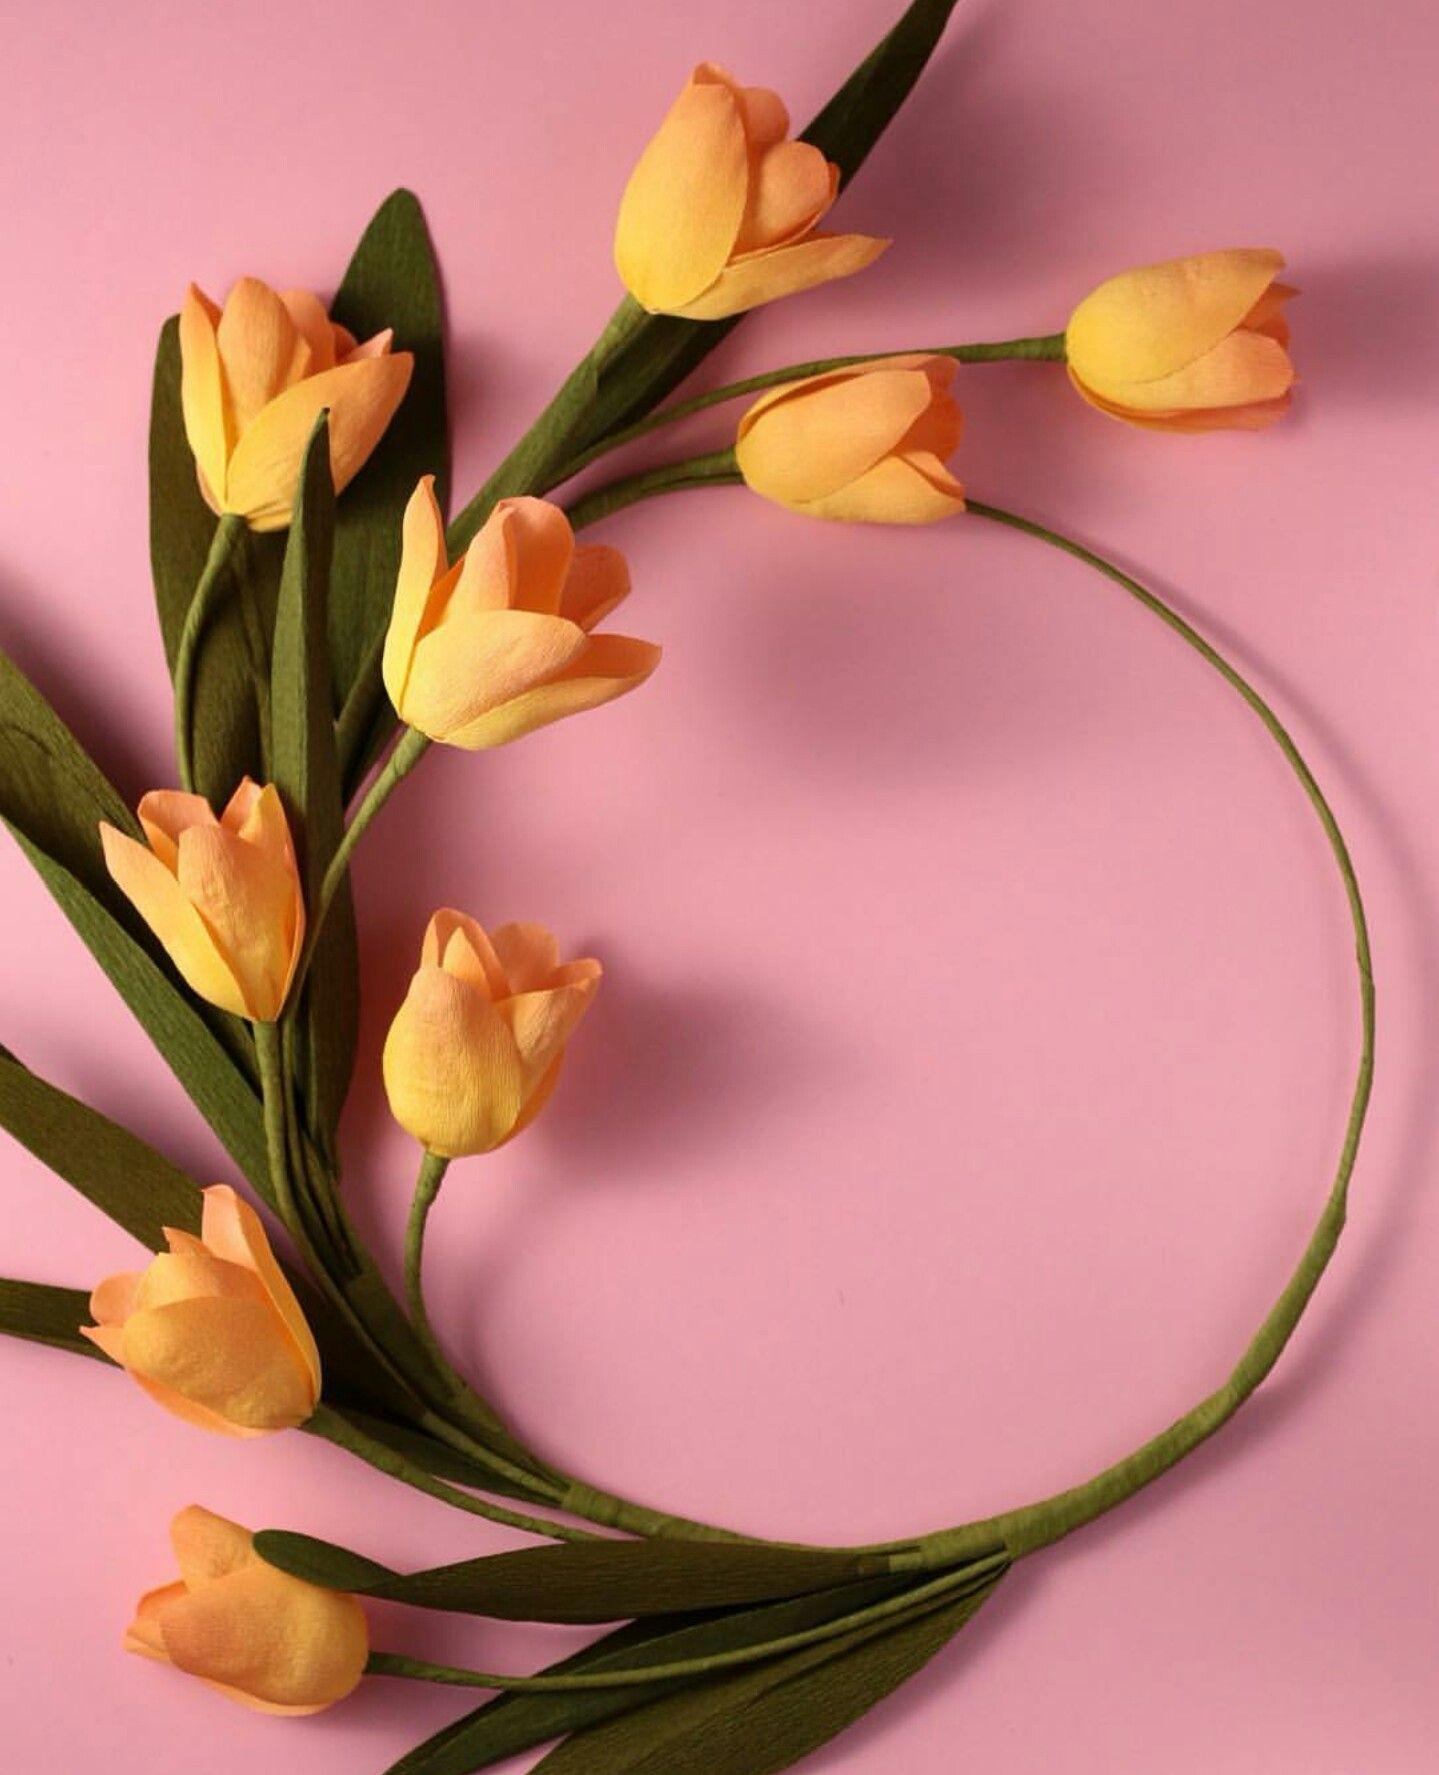 Pin by Erika Sargent on Flor Amor  Pinterest  Wreaths